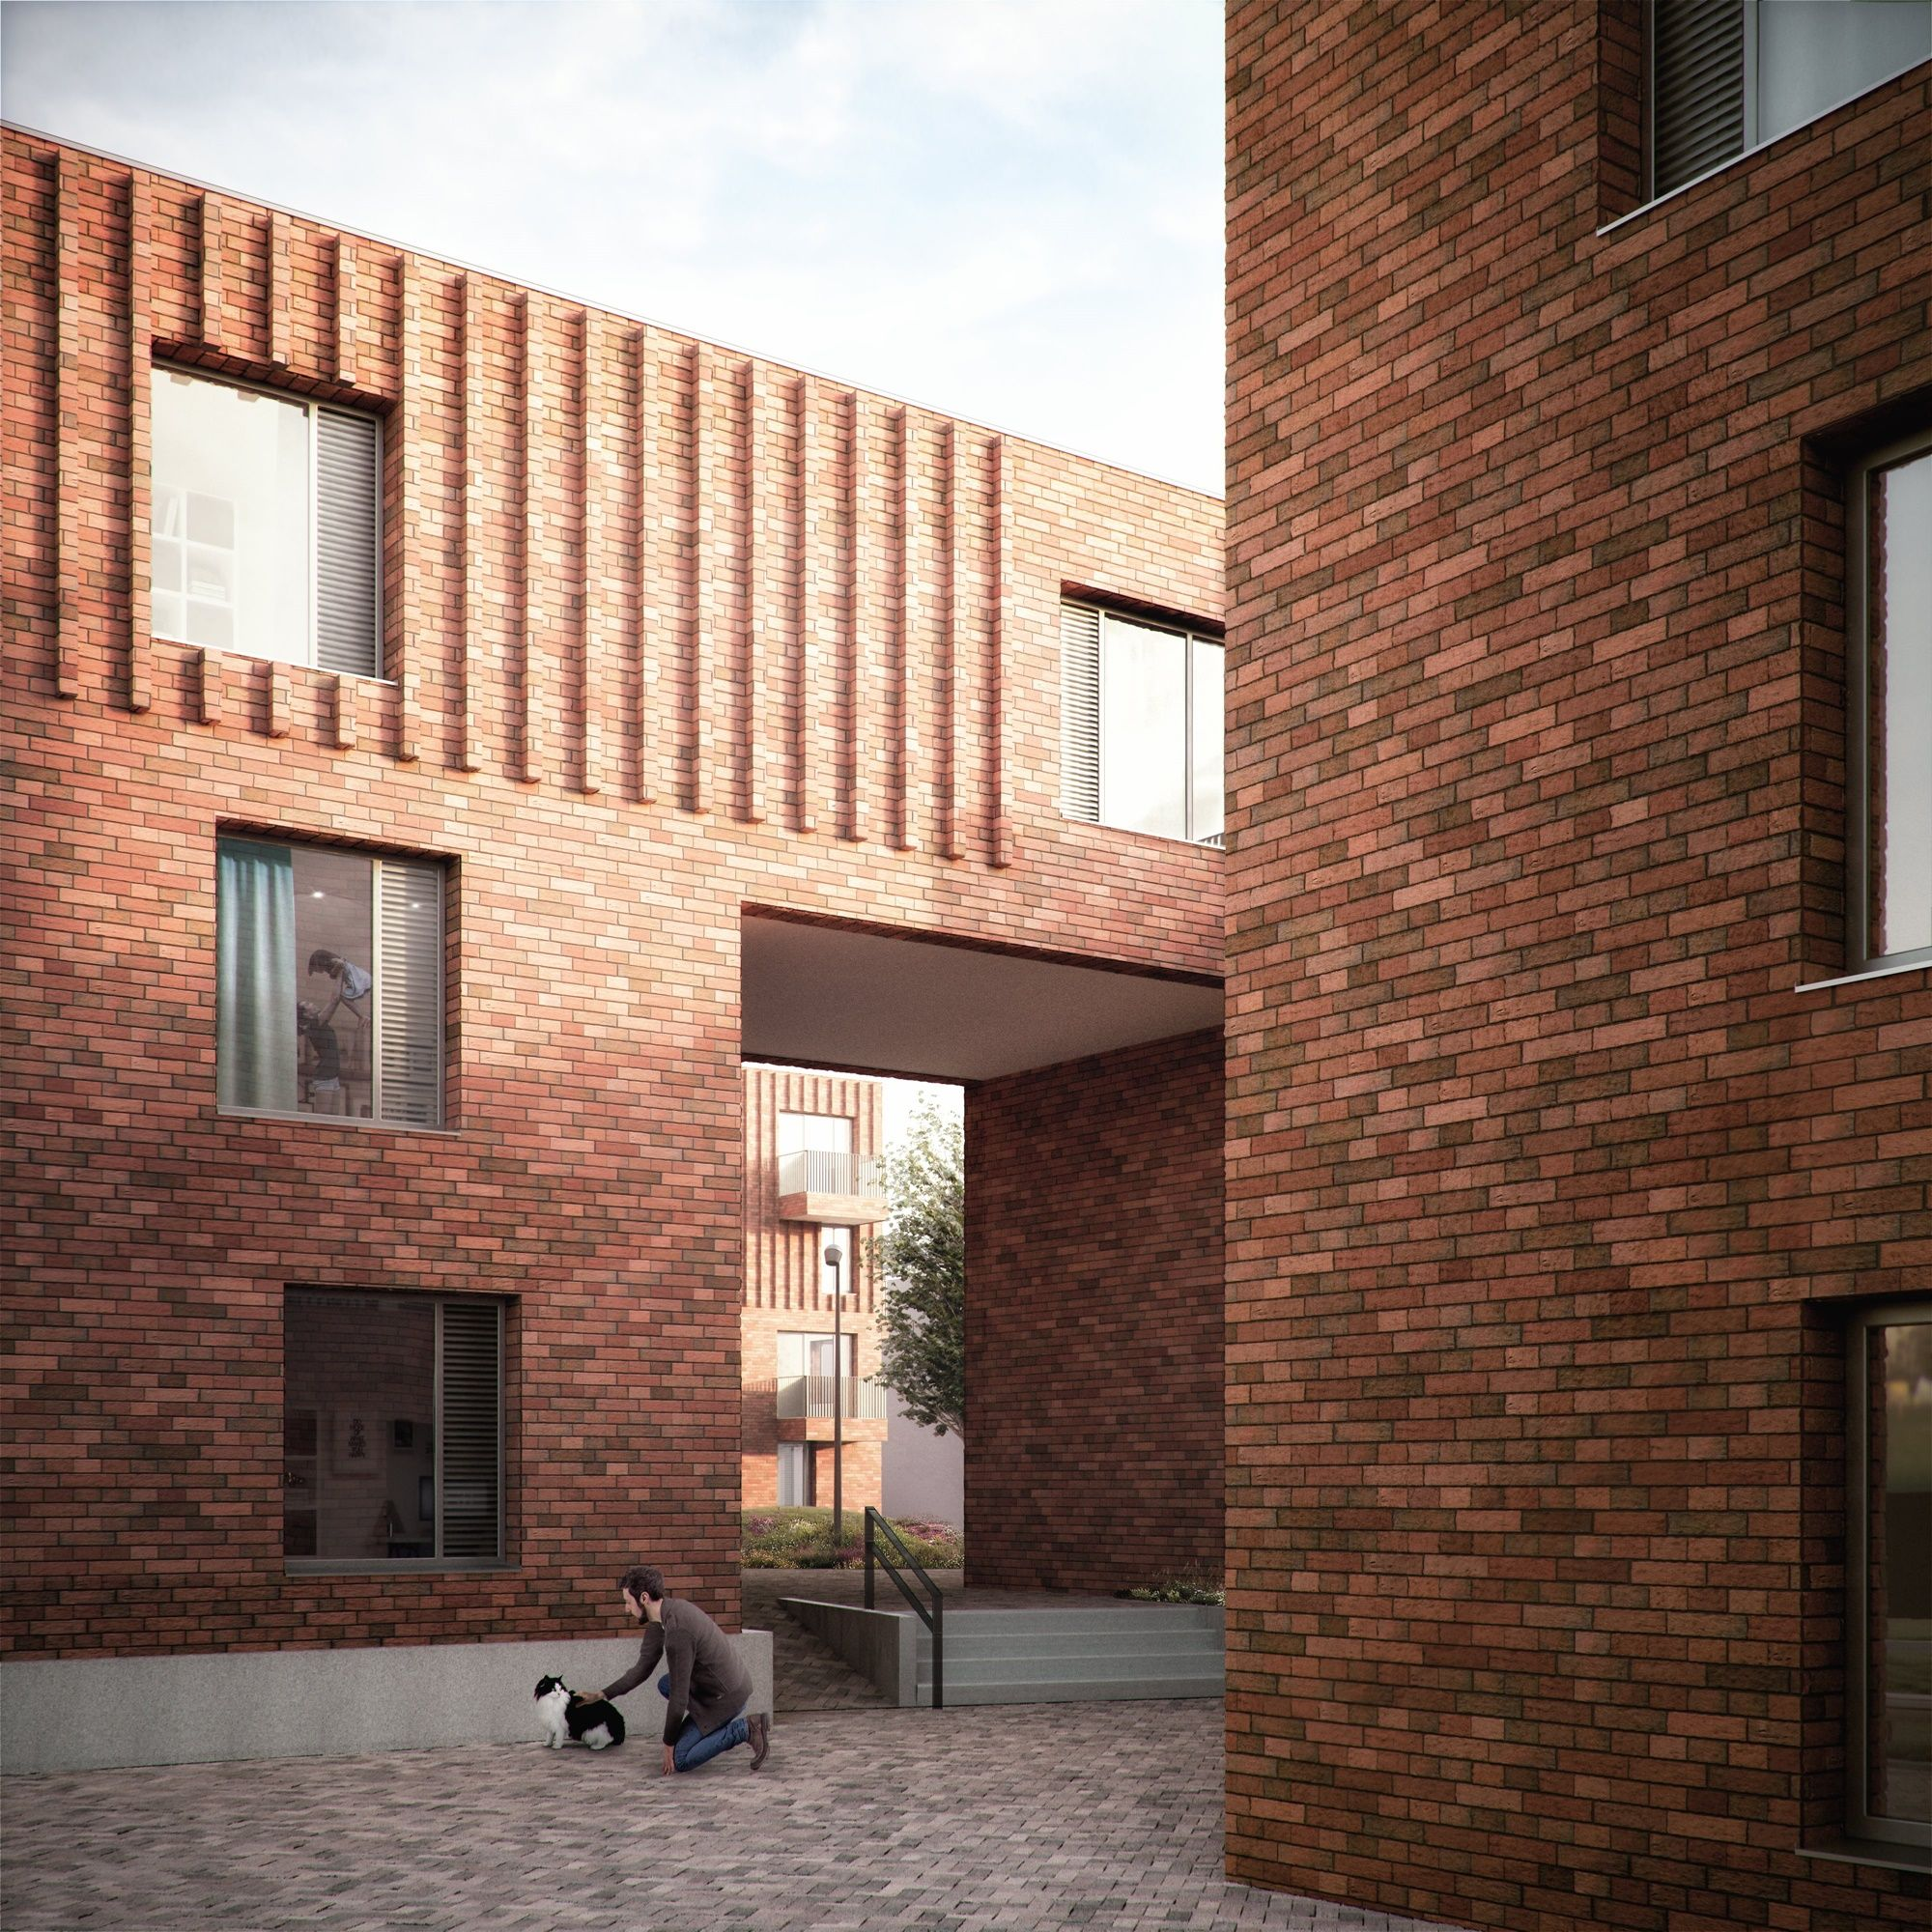 Brick Architecture By Uldis Balodis On Brickwork